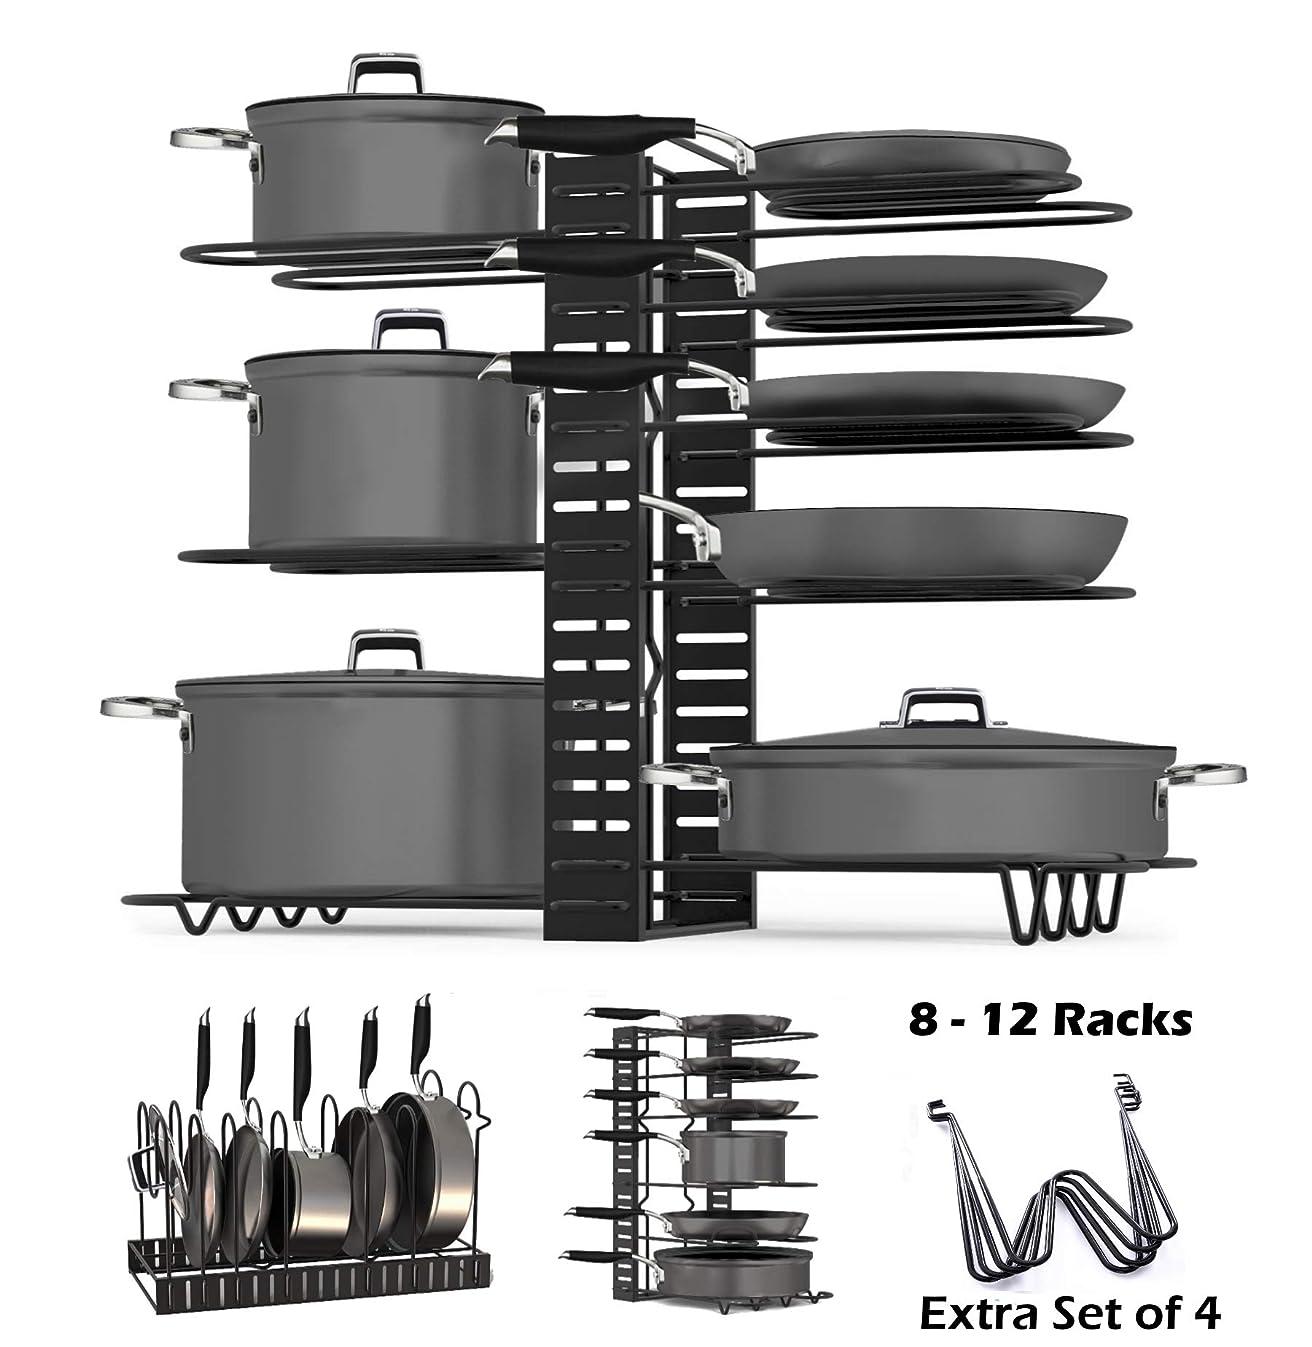 SKATCO Pot Organizer Rack – Metal Pots & Pans Organizer – Pantry & Kitchen Cabinet Organizer – Heavy Duty Lids, Dishes, Pots and Pans Organizer – Horizontal & Vertical Pan Rack with 3 Use Methods